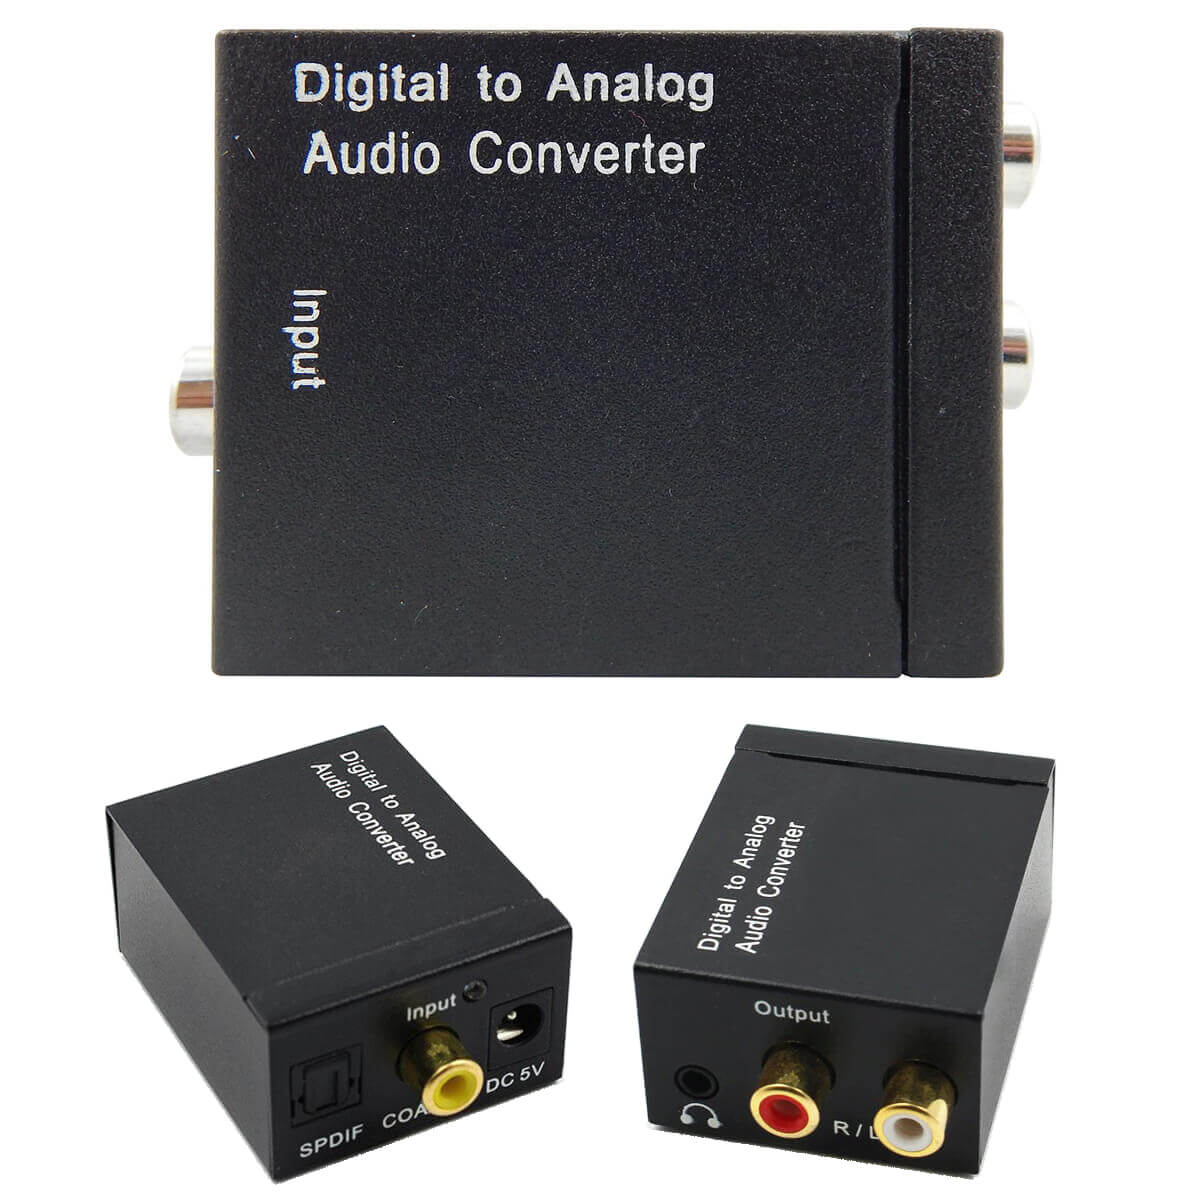 KIT Conversor Áudio Digital para RCA e P2 XT-5529 + Cabo Óptico Toslink 1,5 mts + Cabo Áudio Rca x Rca + Cabo DC 5V